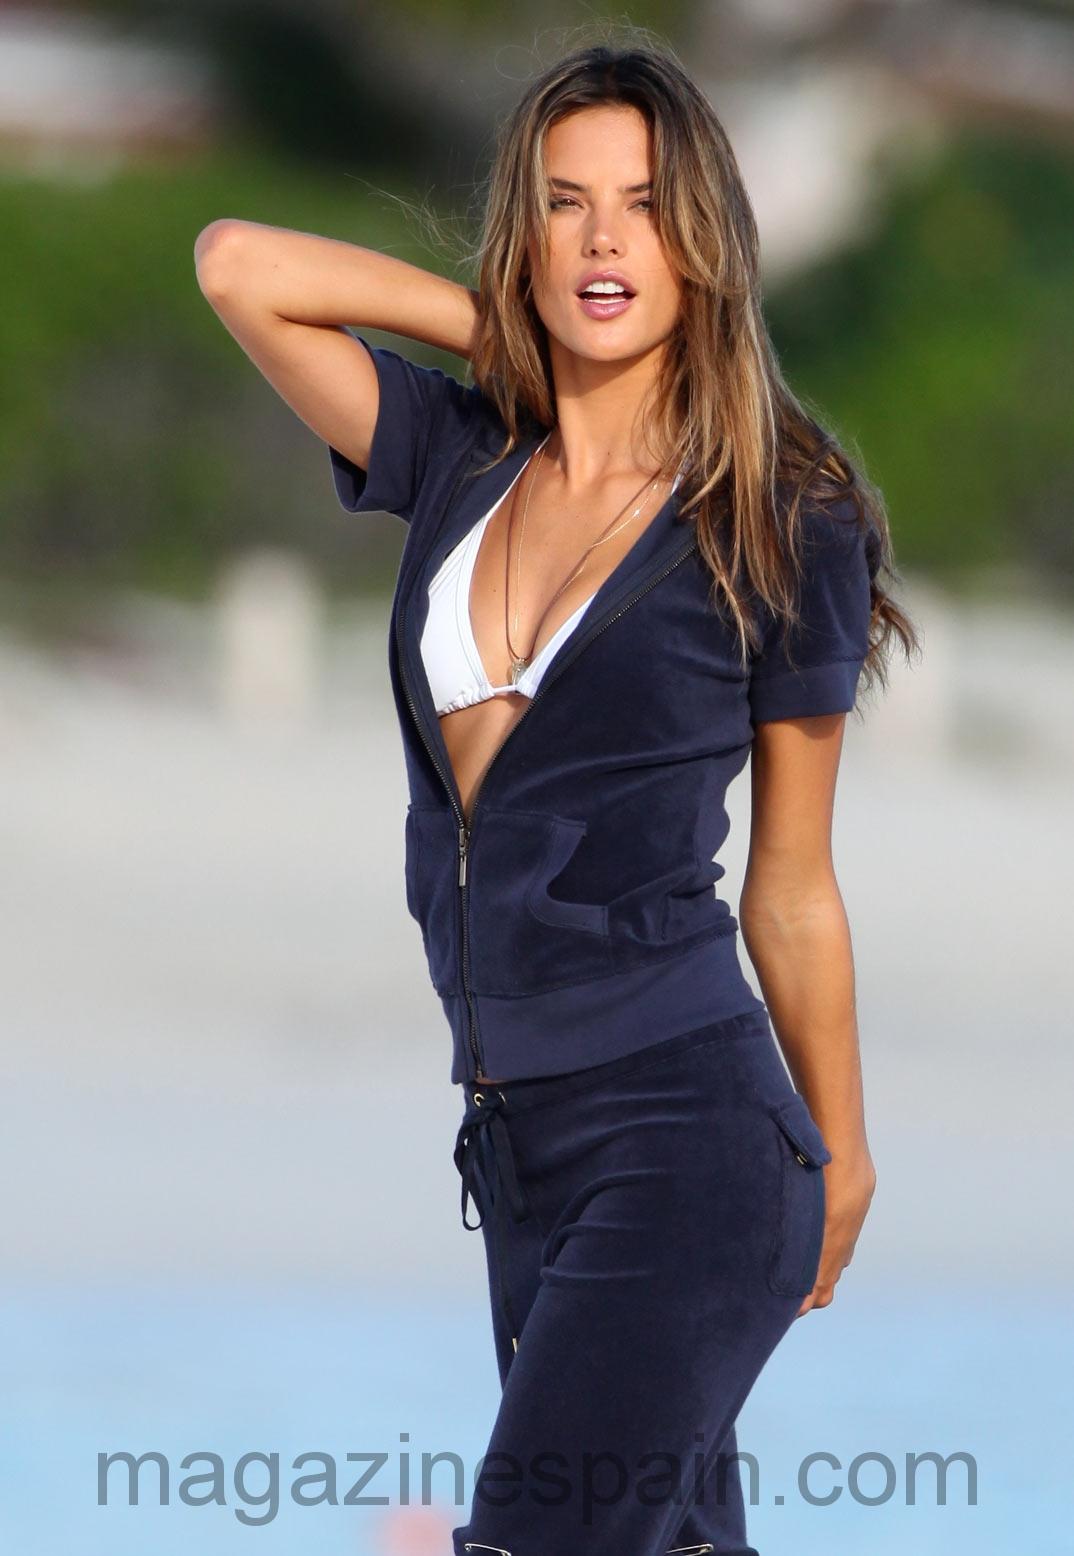 Alessandra Ambrosio 2005